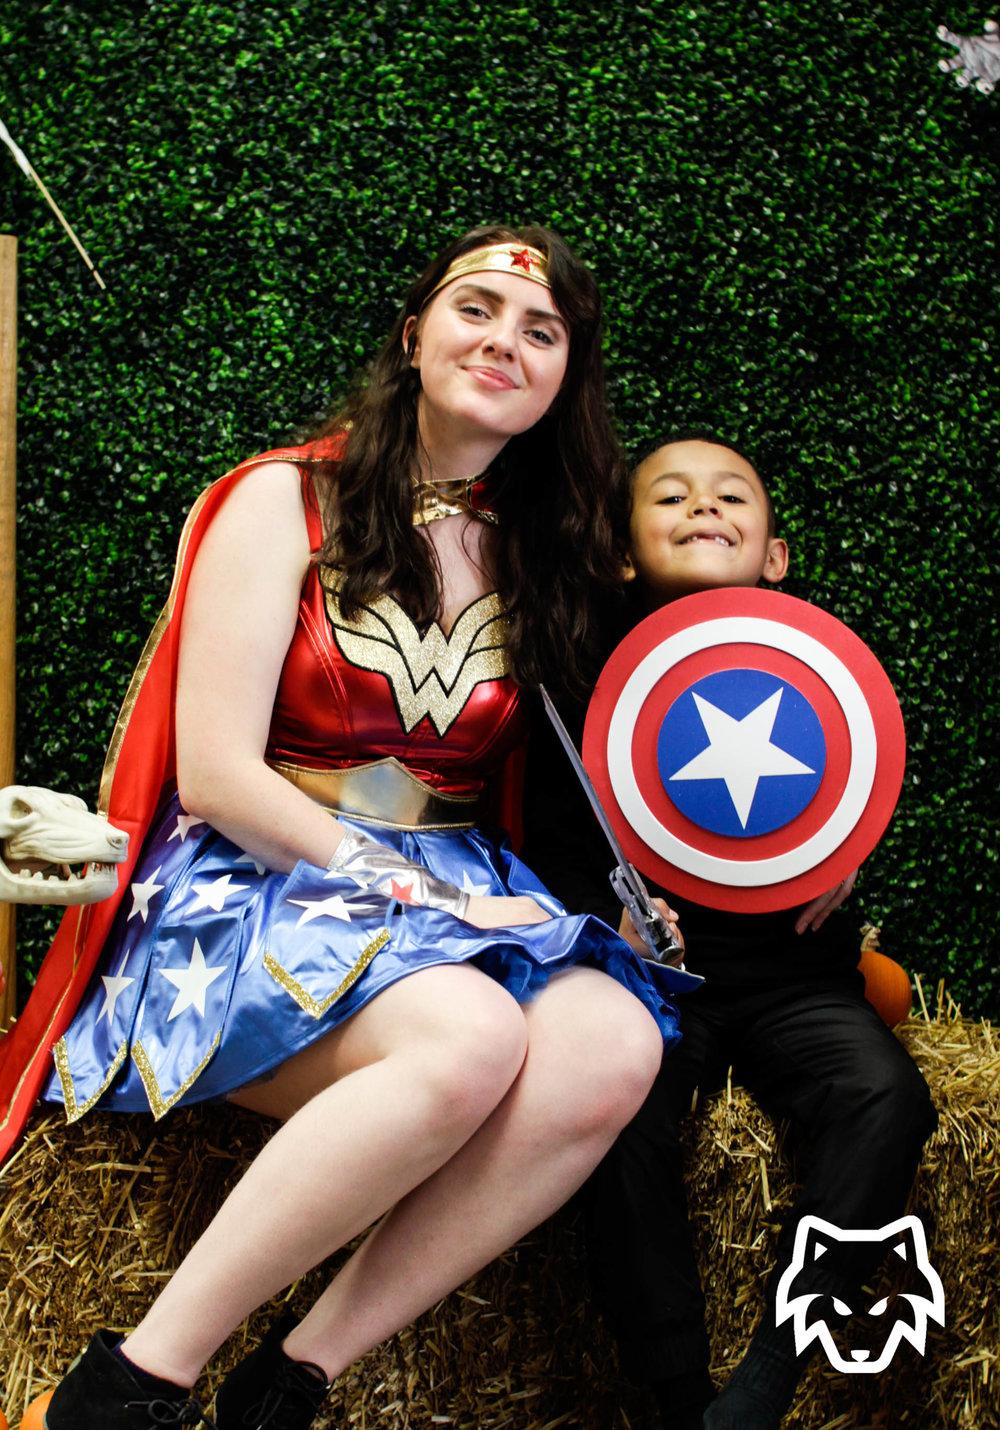 Wonderwoman-Captain-America-Costume